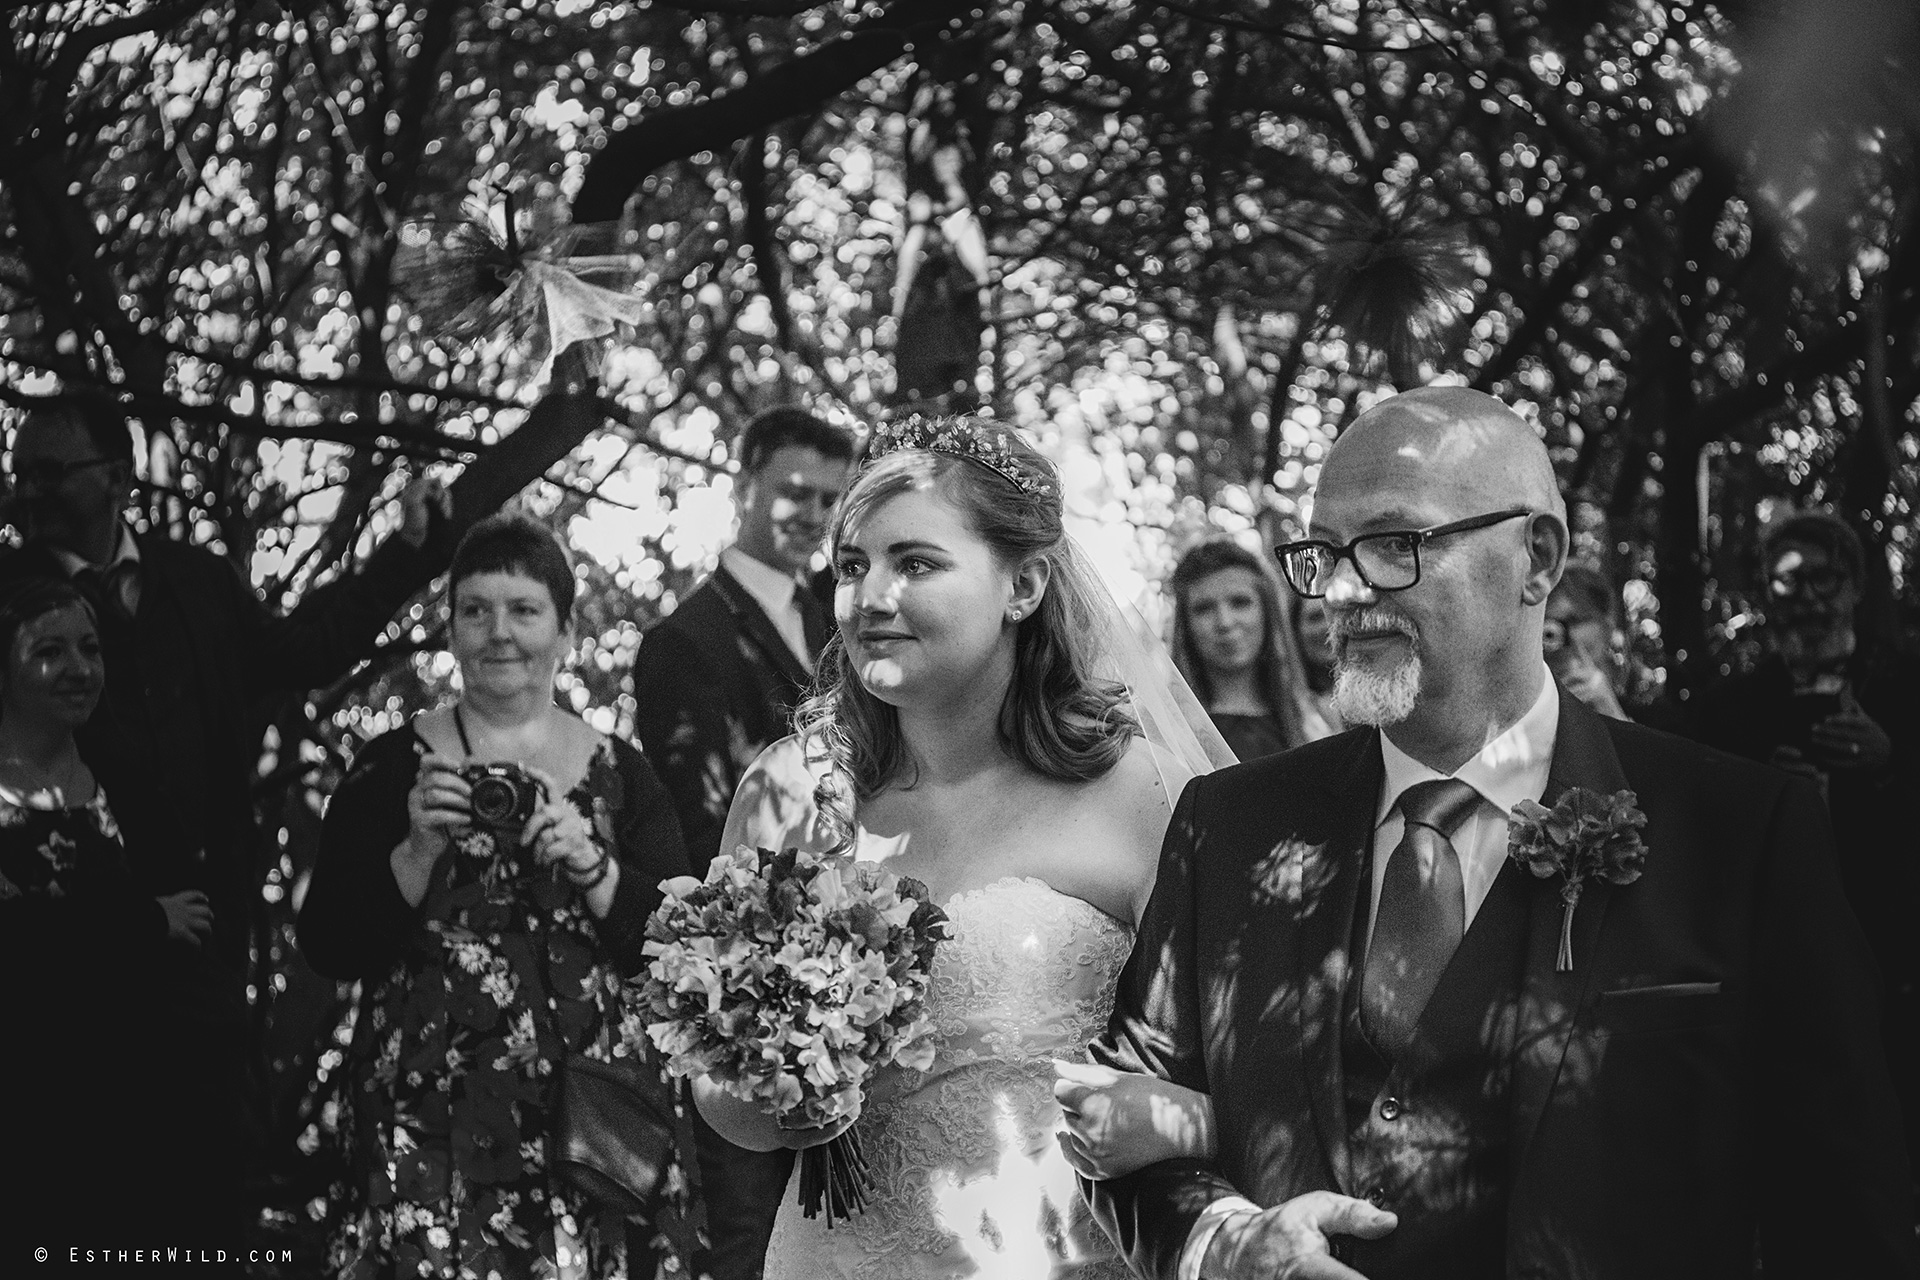 Norfolk_Wedding_Photographer_Mannington_Hall_Country_Esther_Wild_0968-1.jpg